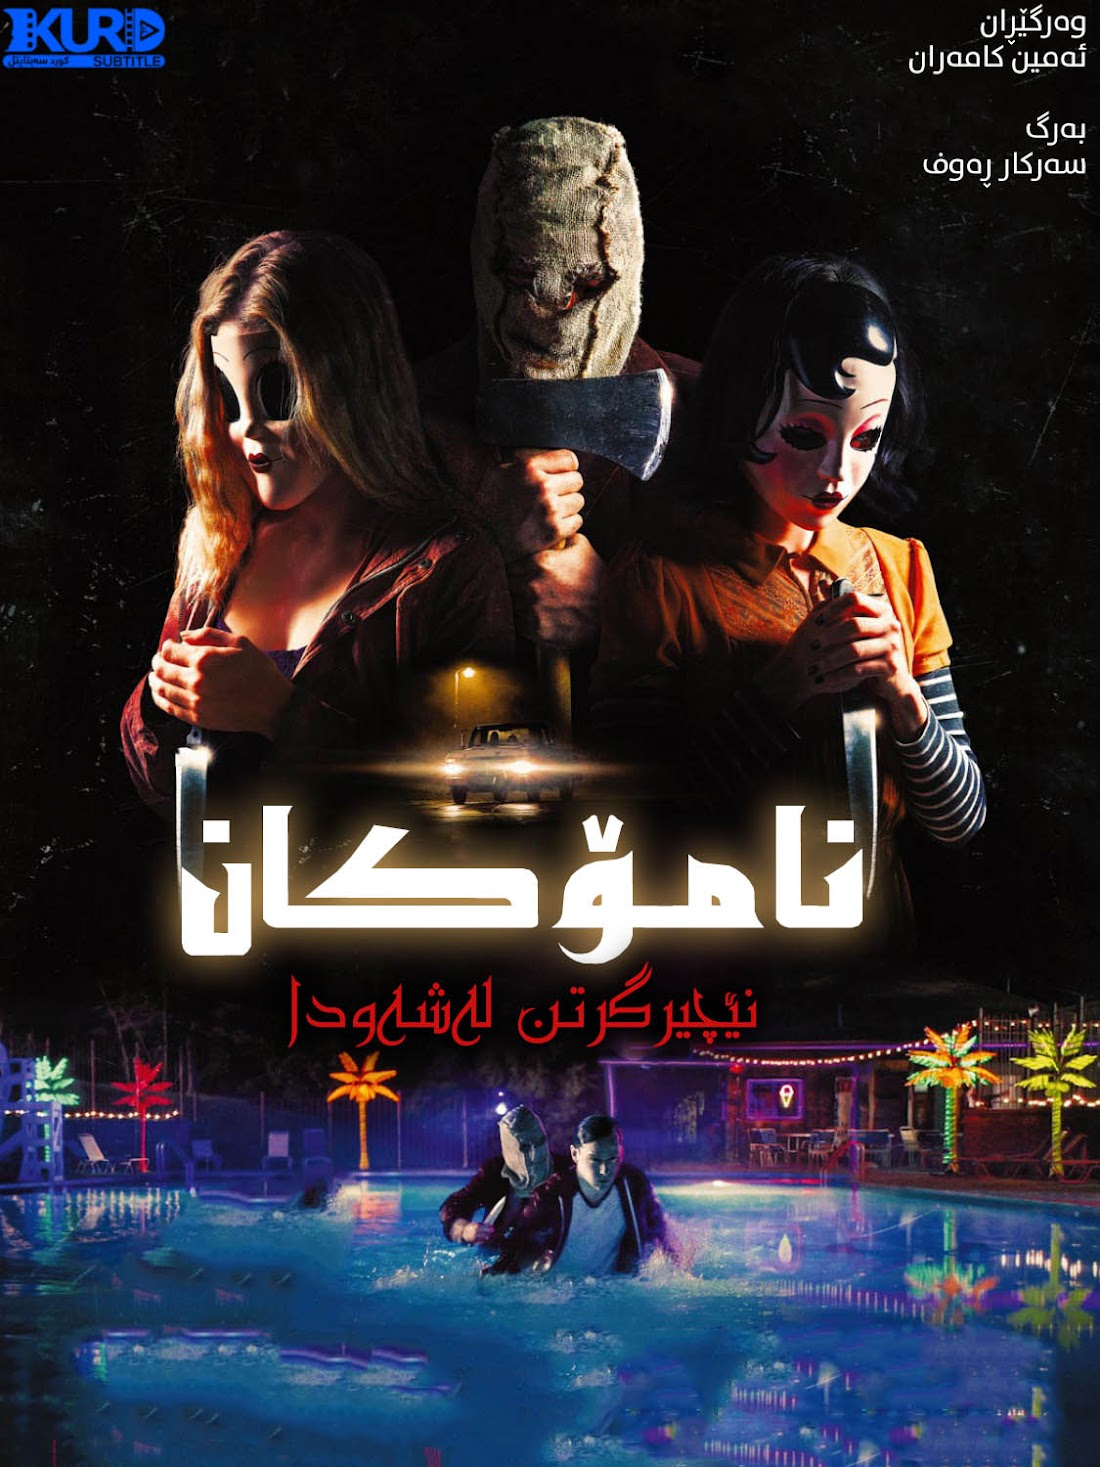 The Strangers: Prey at Night kurdish poster